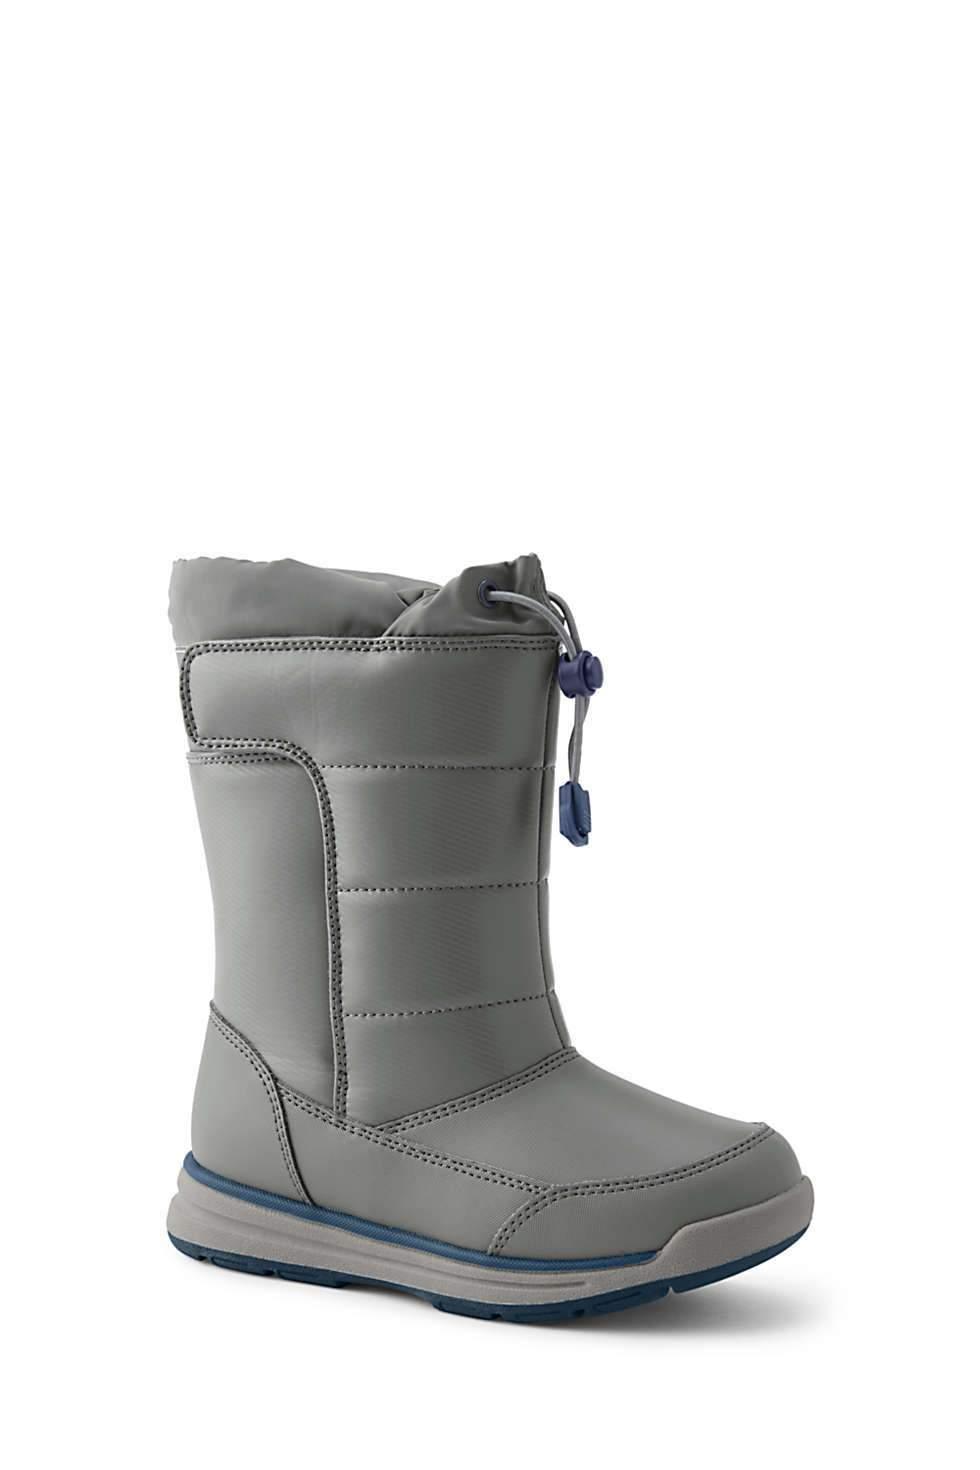 Lands' End Kids' Snow Flurry Winter Boots